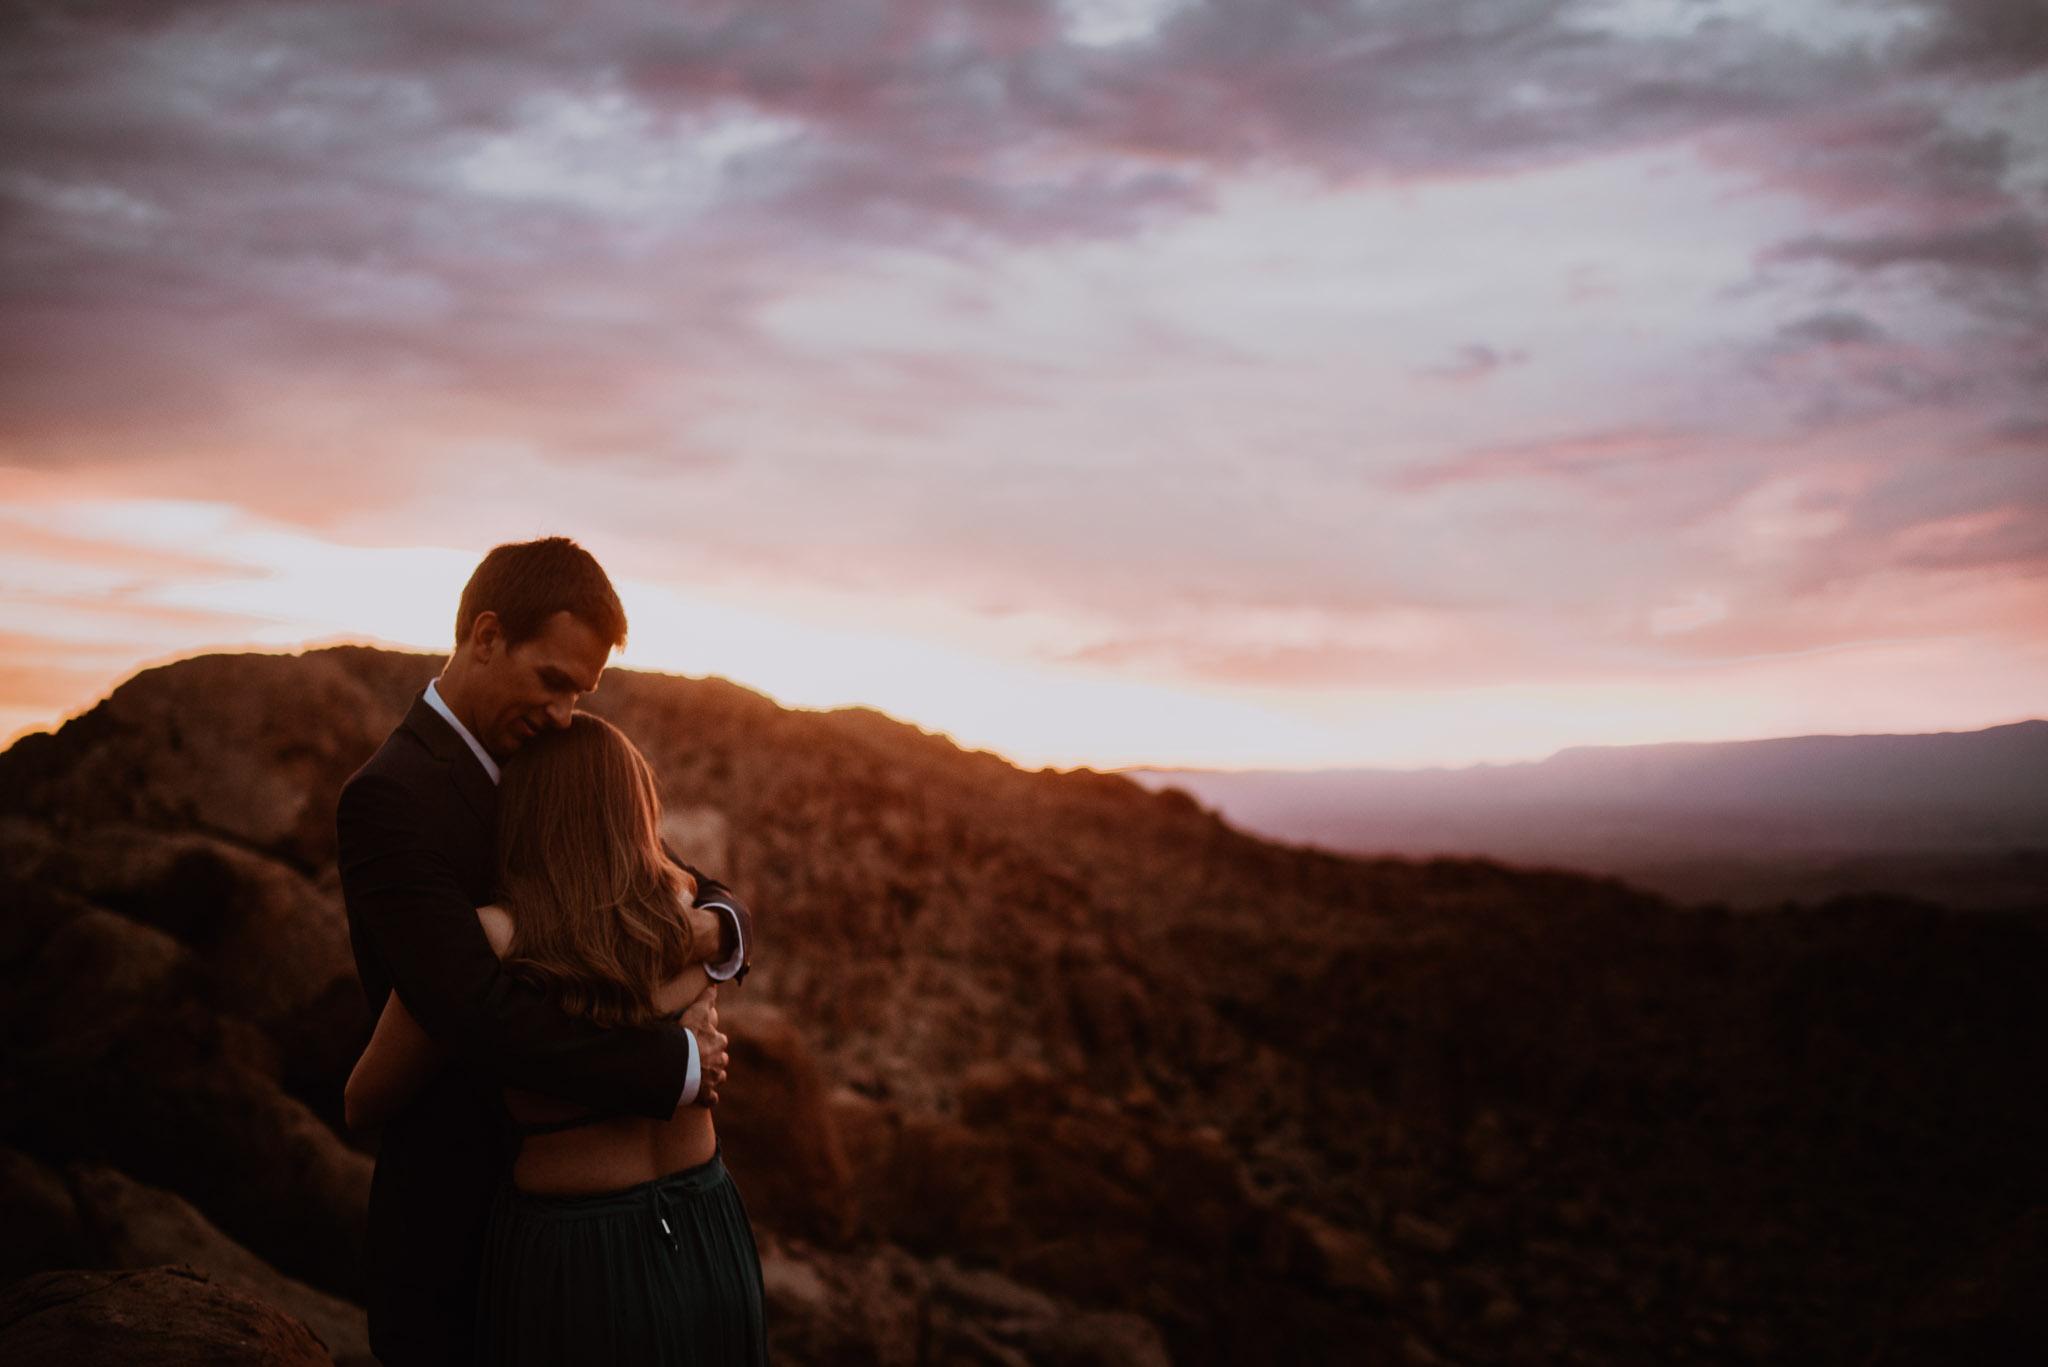 deset-elopement-big-bend-engagement-photos4.jpg